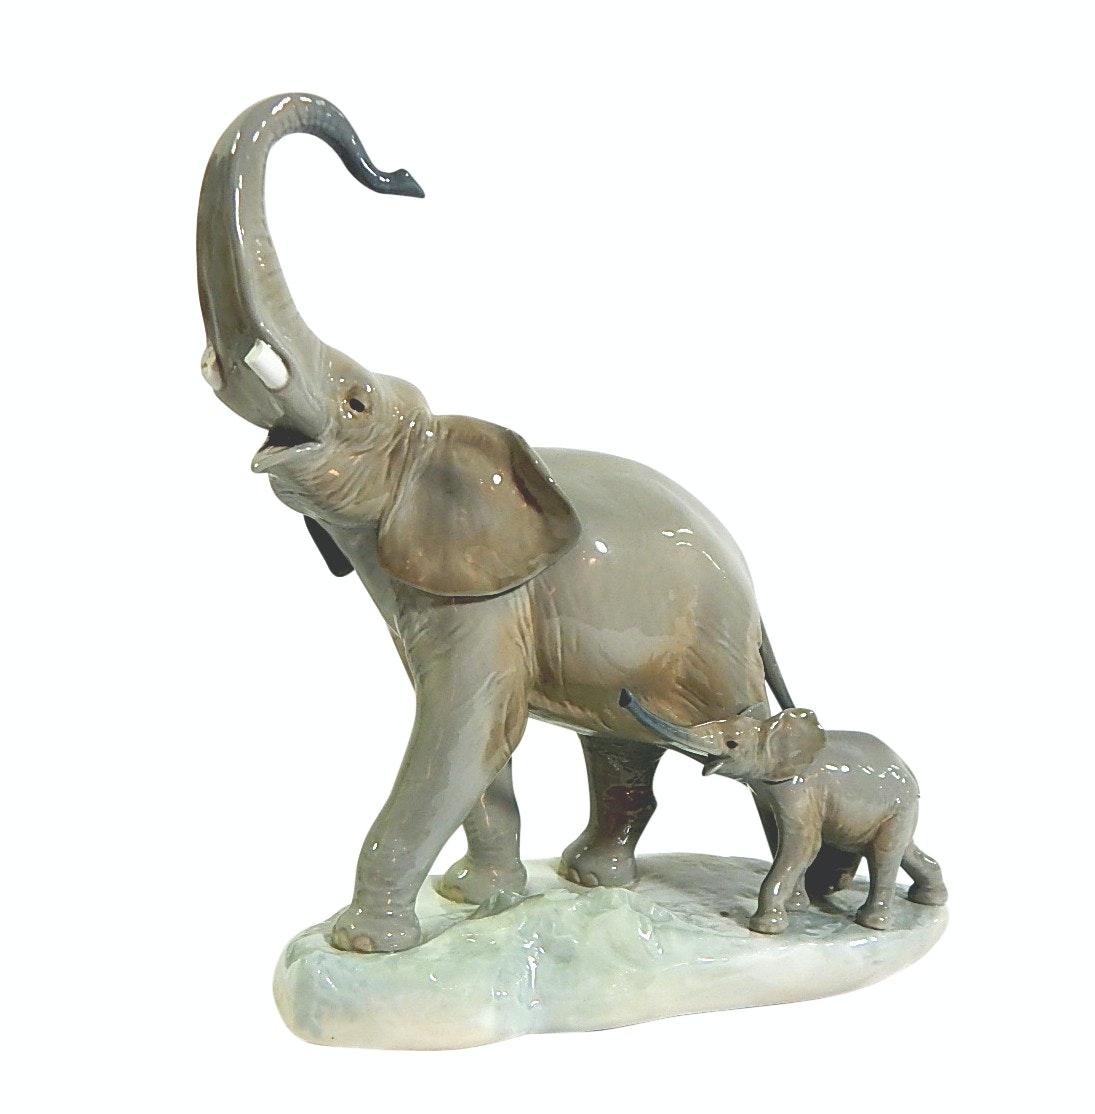 "Lladro ""Two Elephants"" Porcelain Figurine - Broken Tusks"